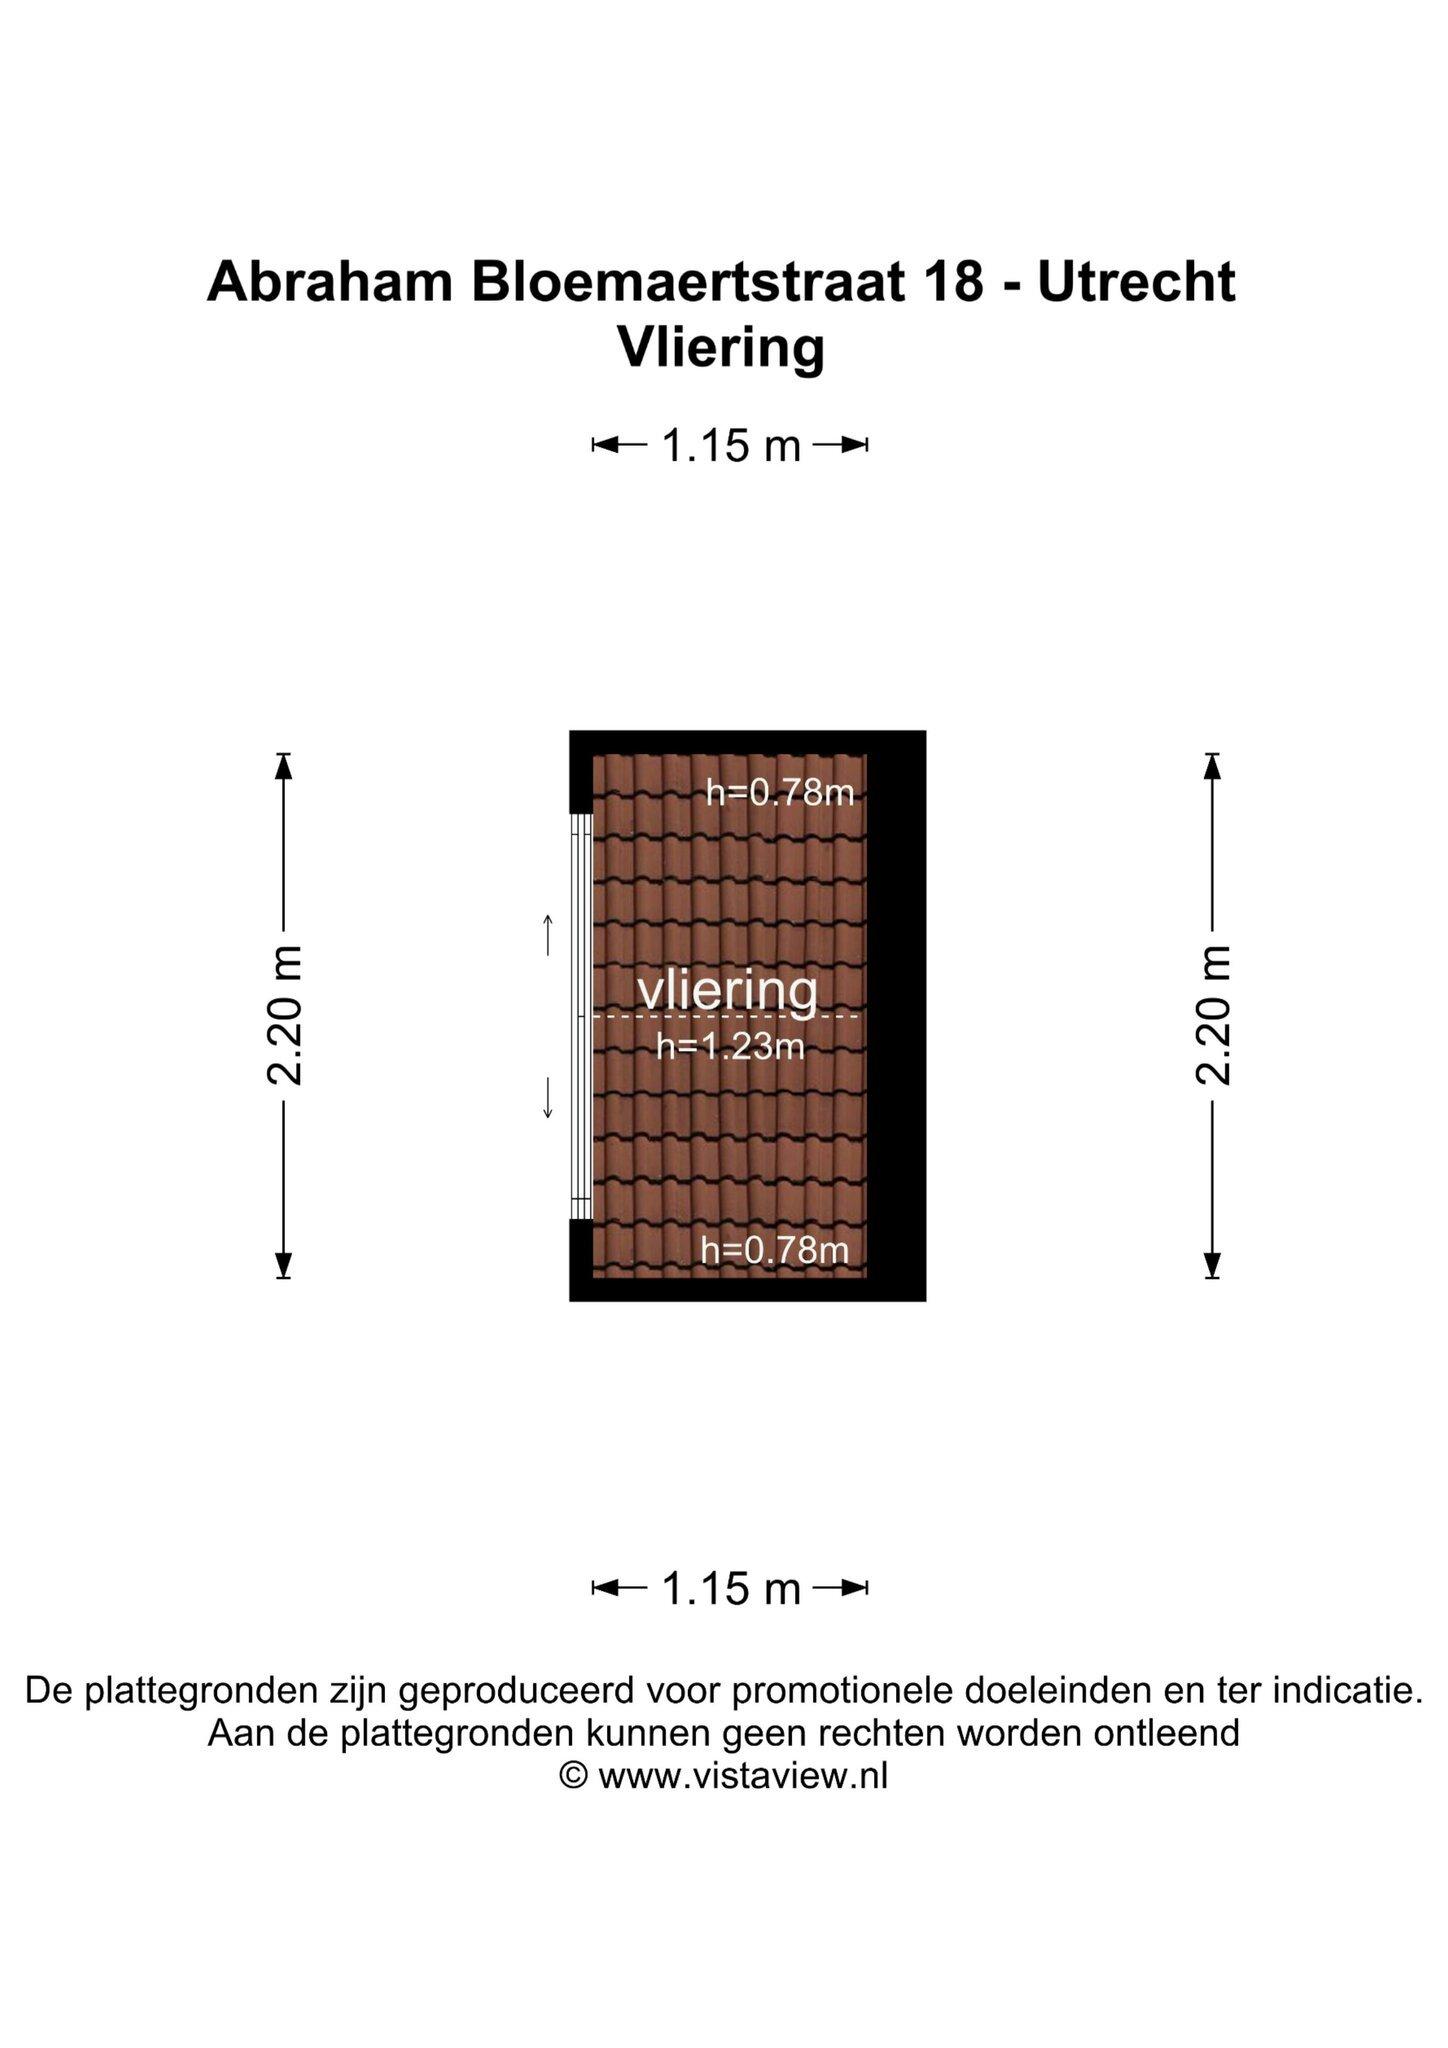 Plattegrond Abraham Bloemaertstraat 18